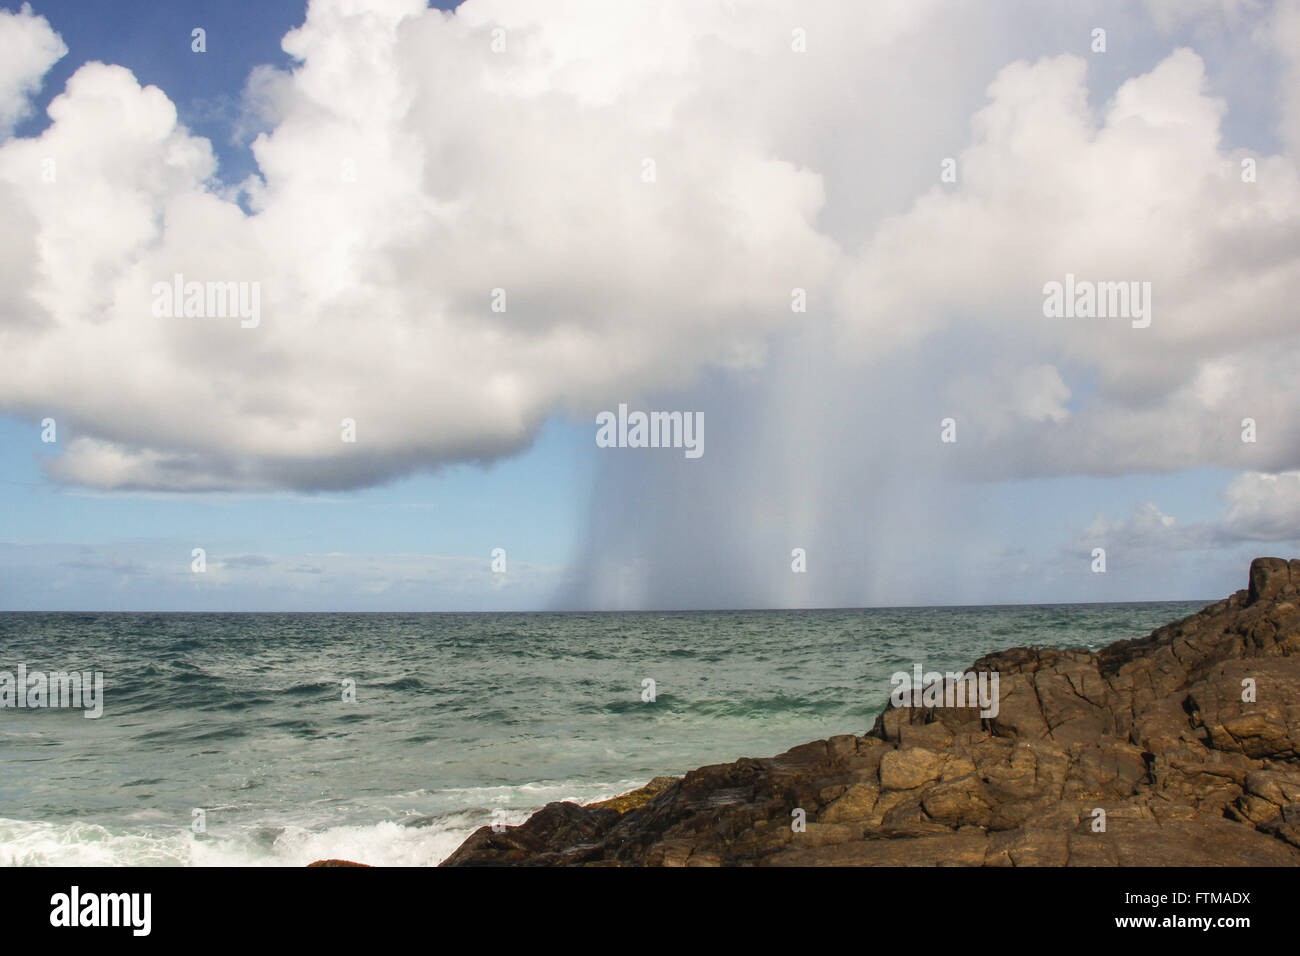 Precipitation of rain on the Prainha - Stock Image